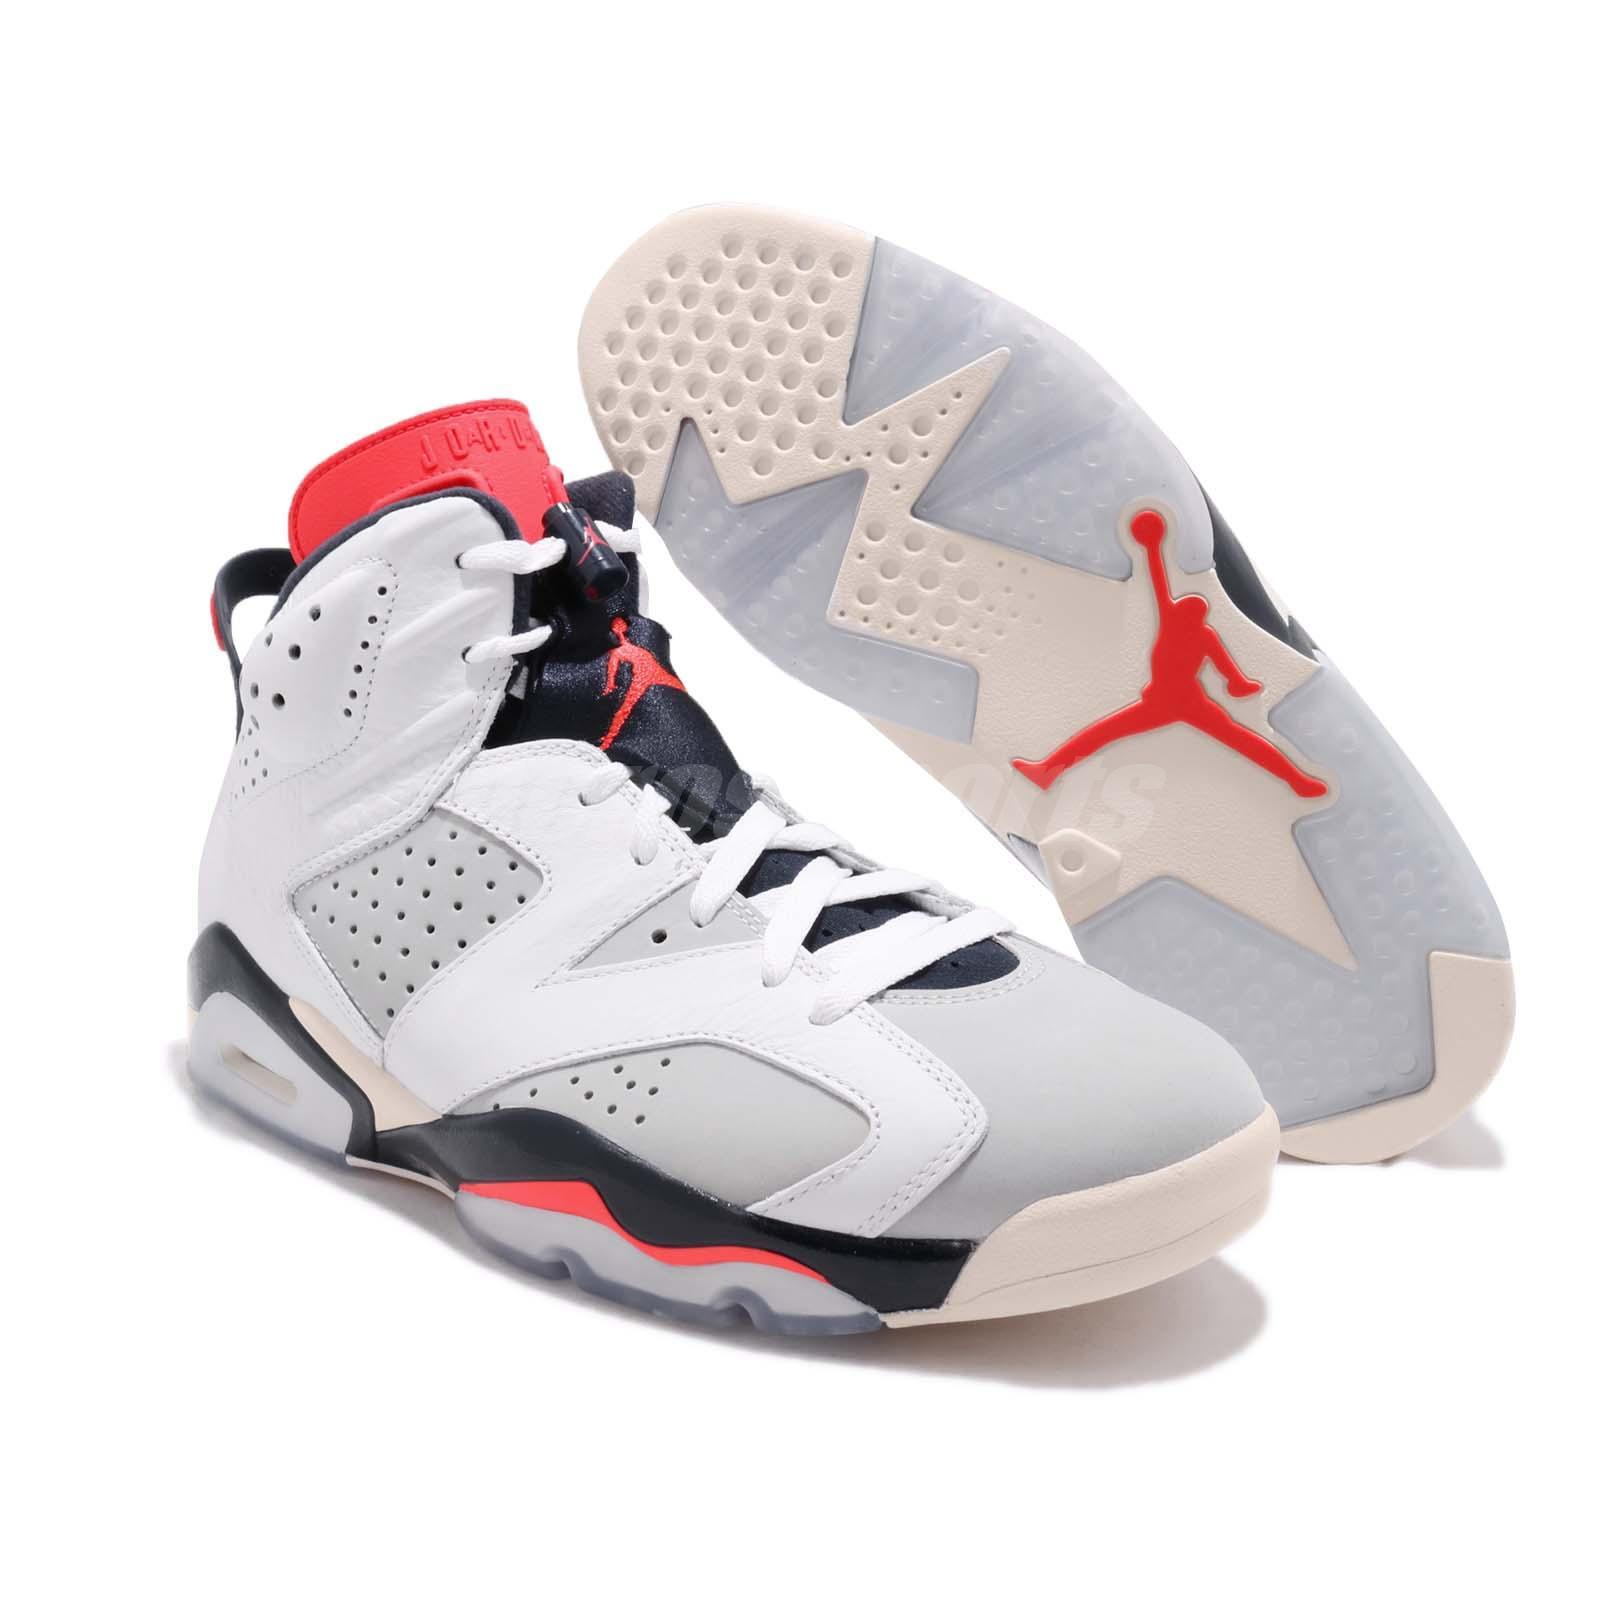 88368731a62 ... coupon for nike air jordan 6 retro tinker hatfield white infrared 23  grey vi f465f 0a58c